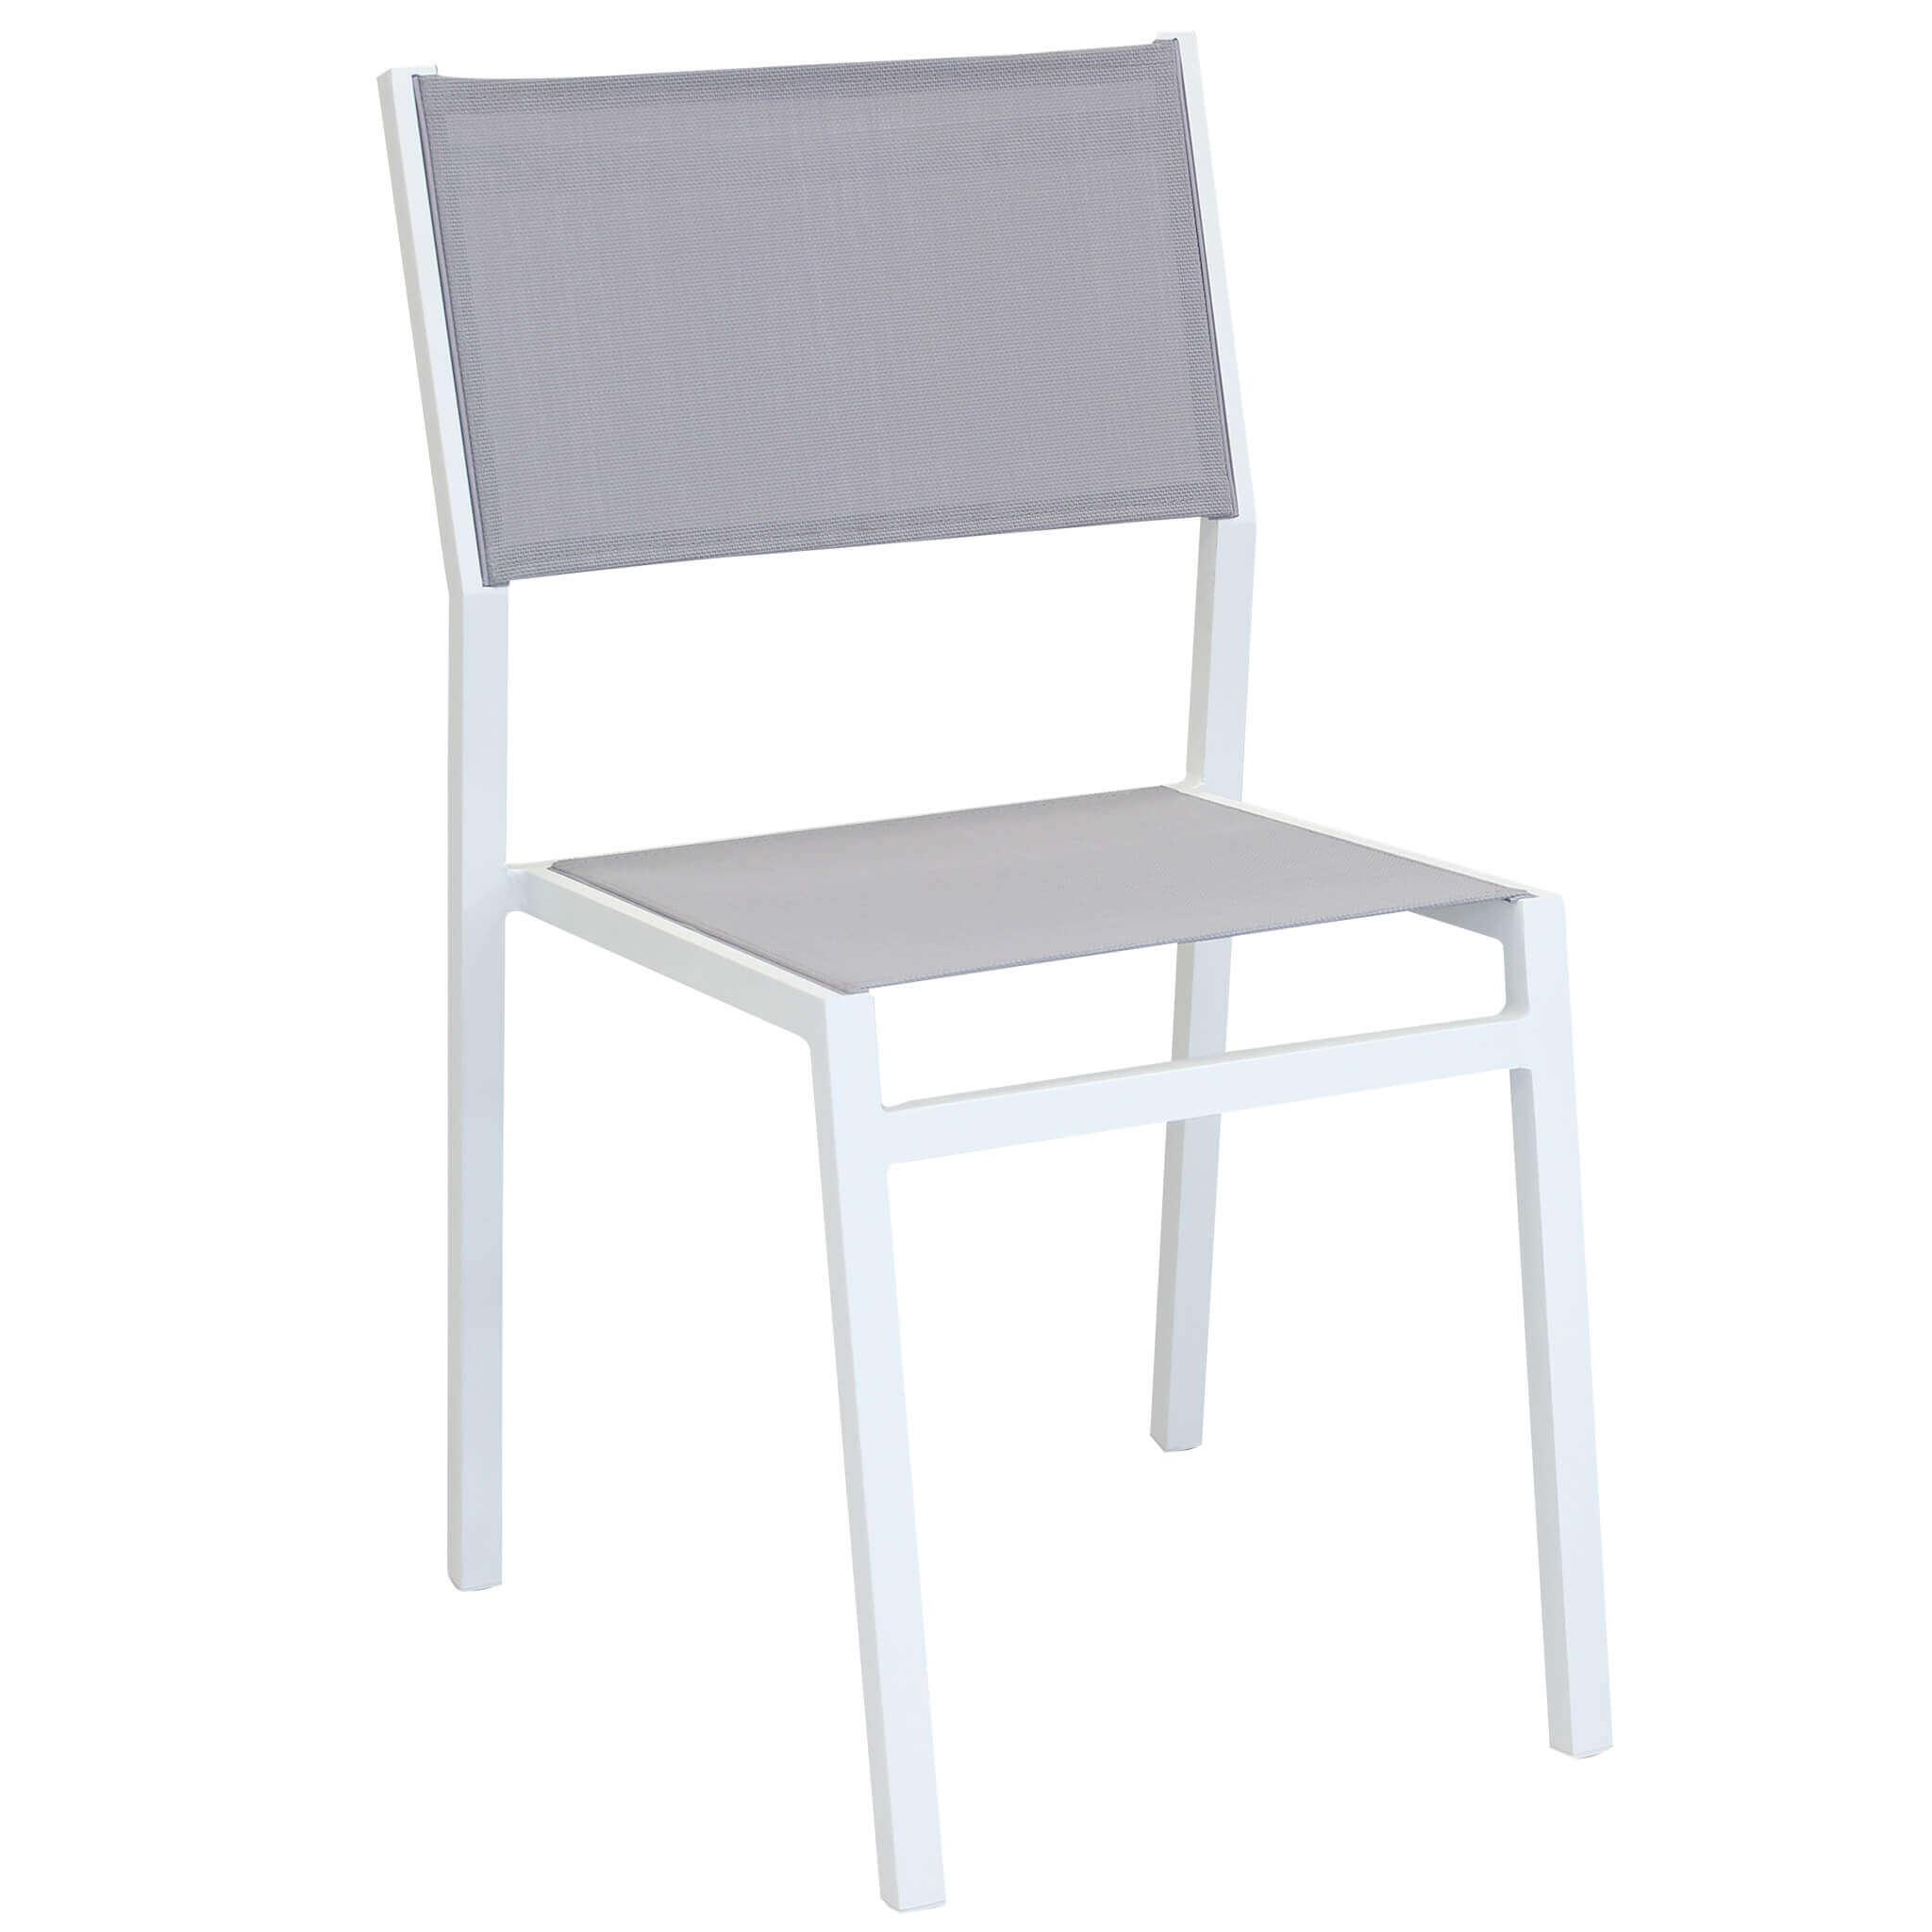 milani home aulus - sedia da giardino in alluminio e textilene impilabile